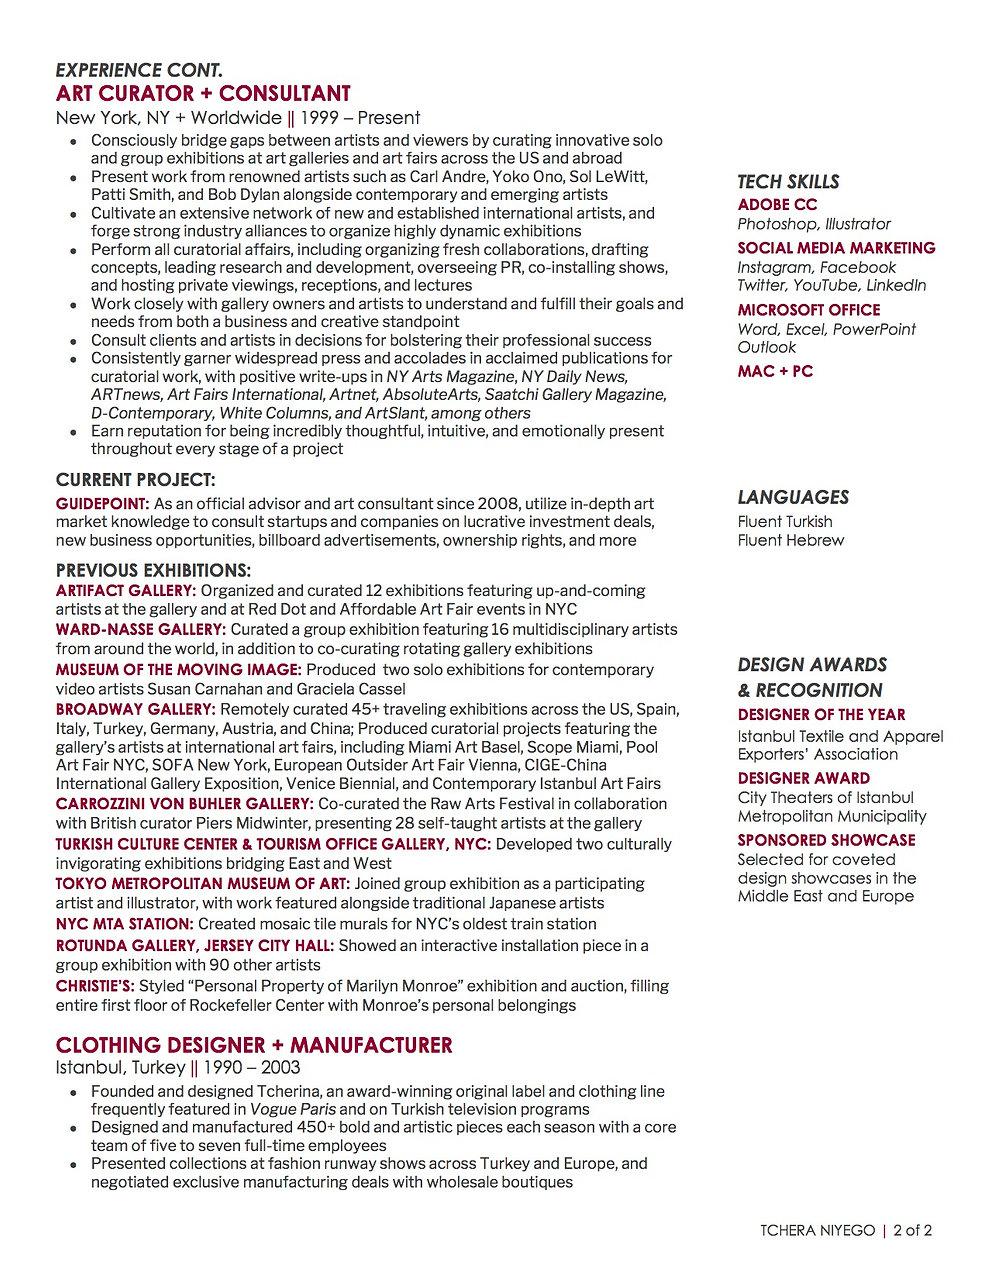 Tchera-Niyego-Resume-2020 page2.jpg